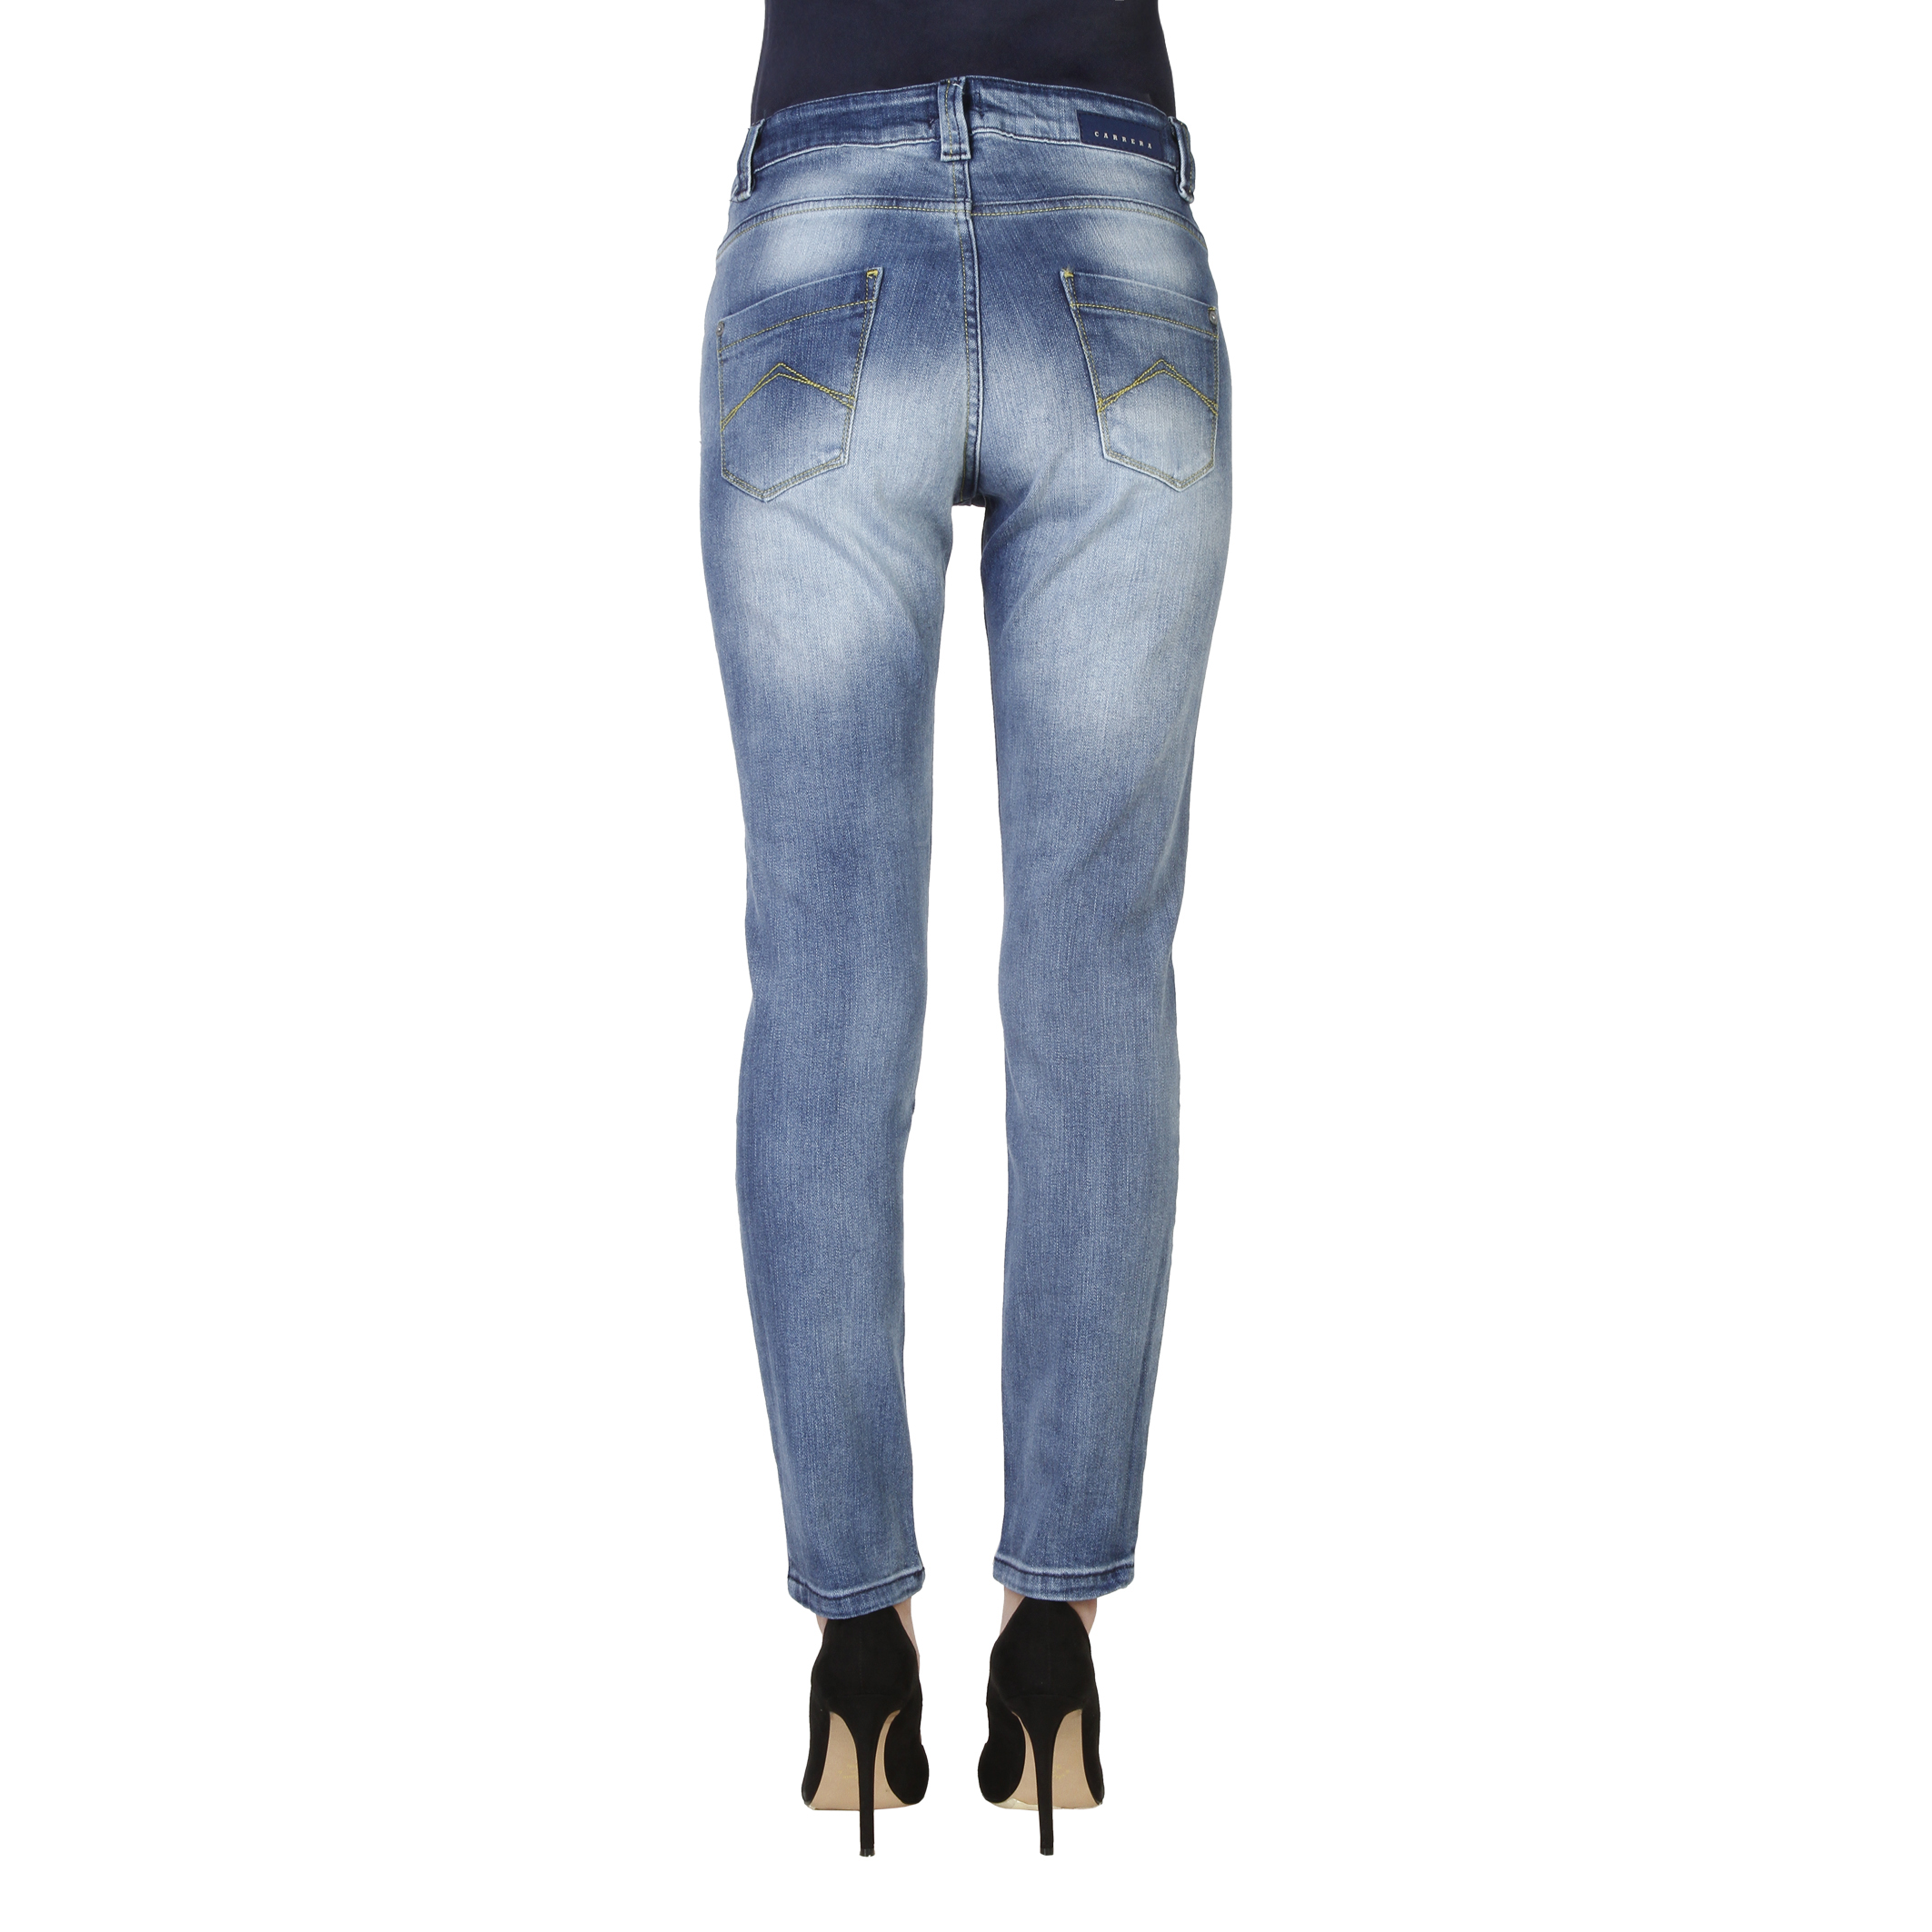 Jeans   Carrera Jeans 00771C_0970A blue